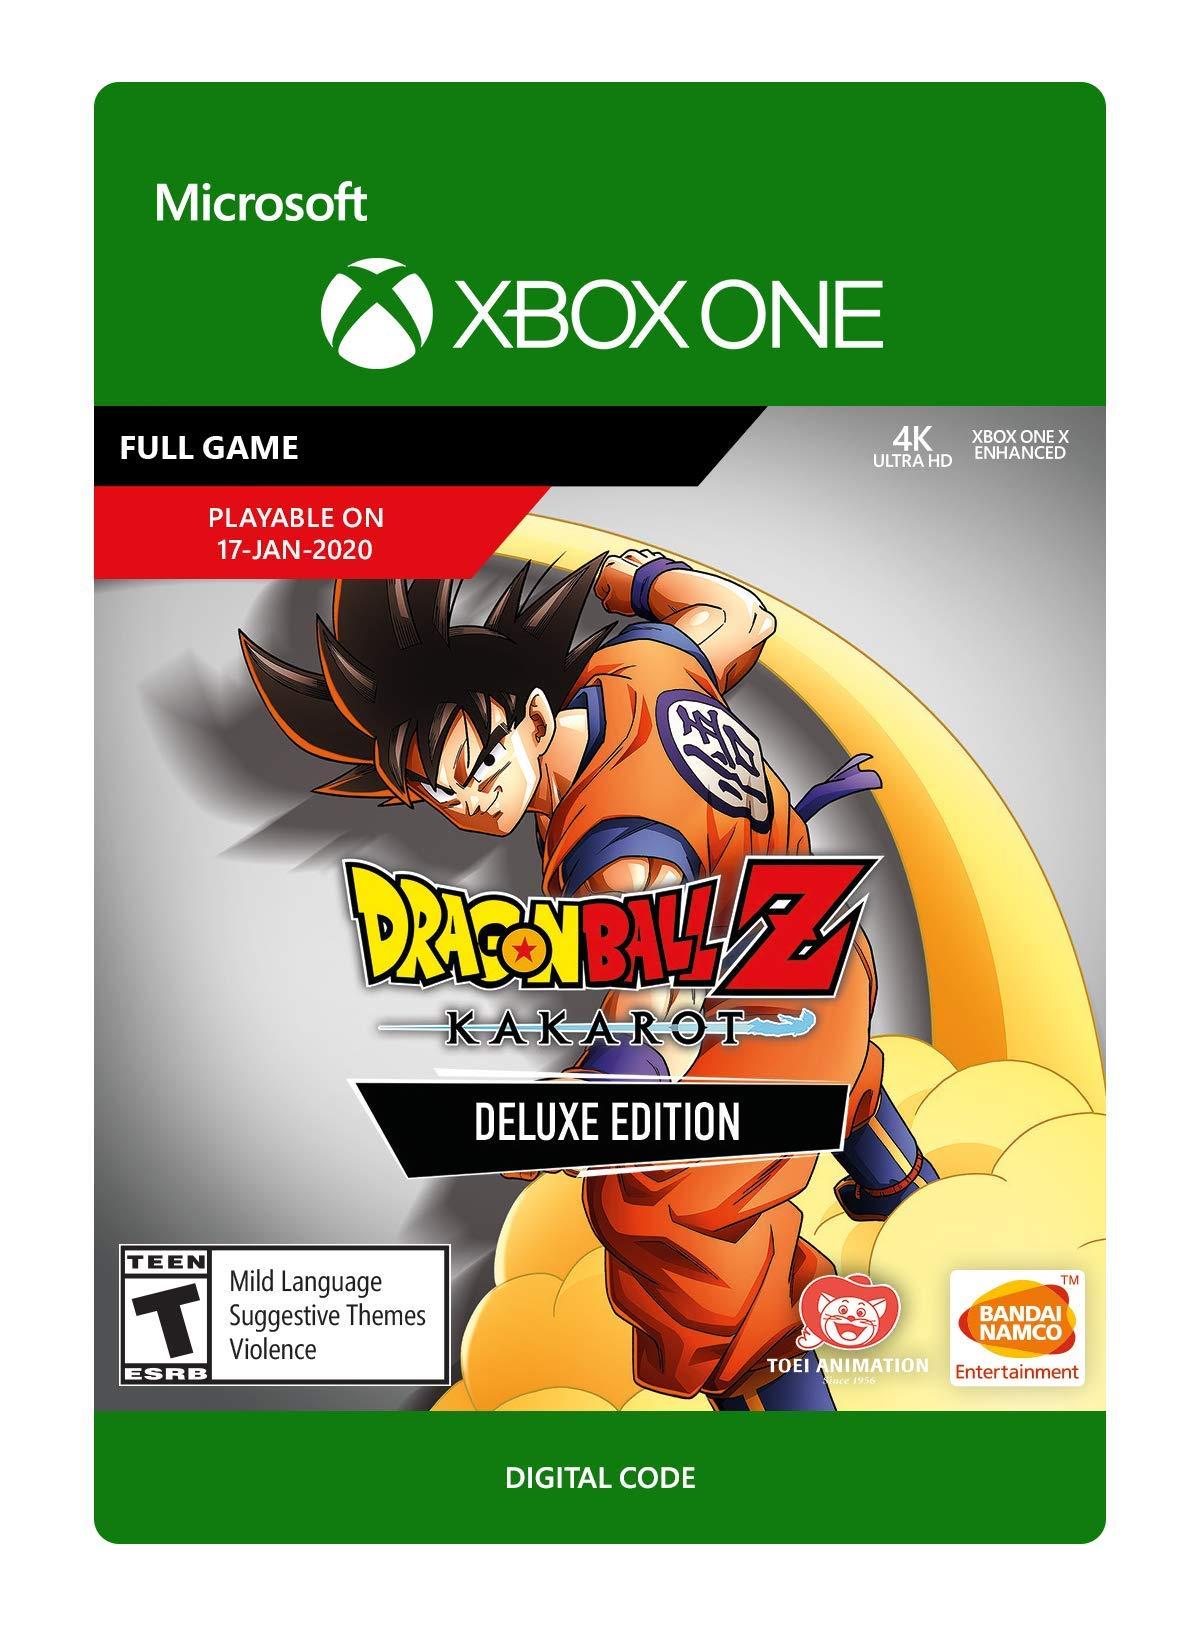 ✅ DRAGON BALL Z: KAKAROT Deluxe Edition XBOX ONE Ключ🔑